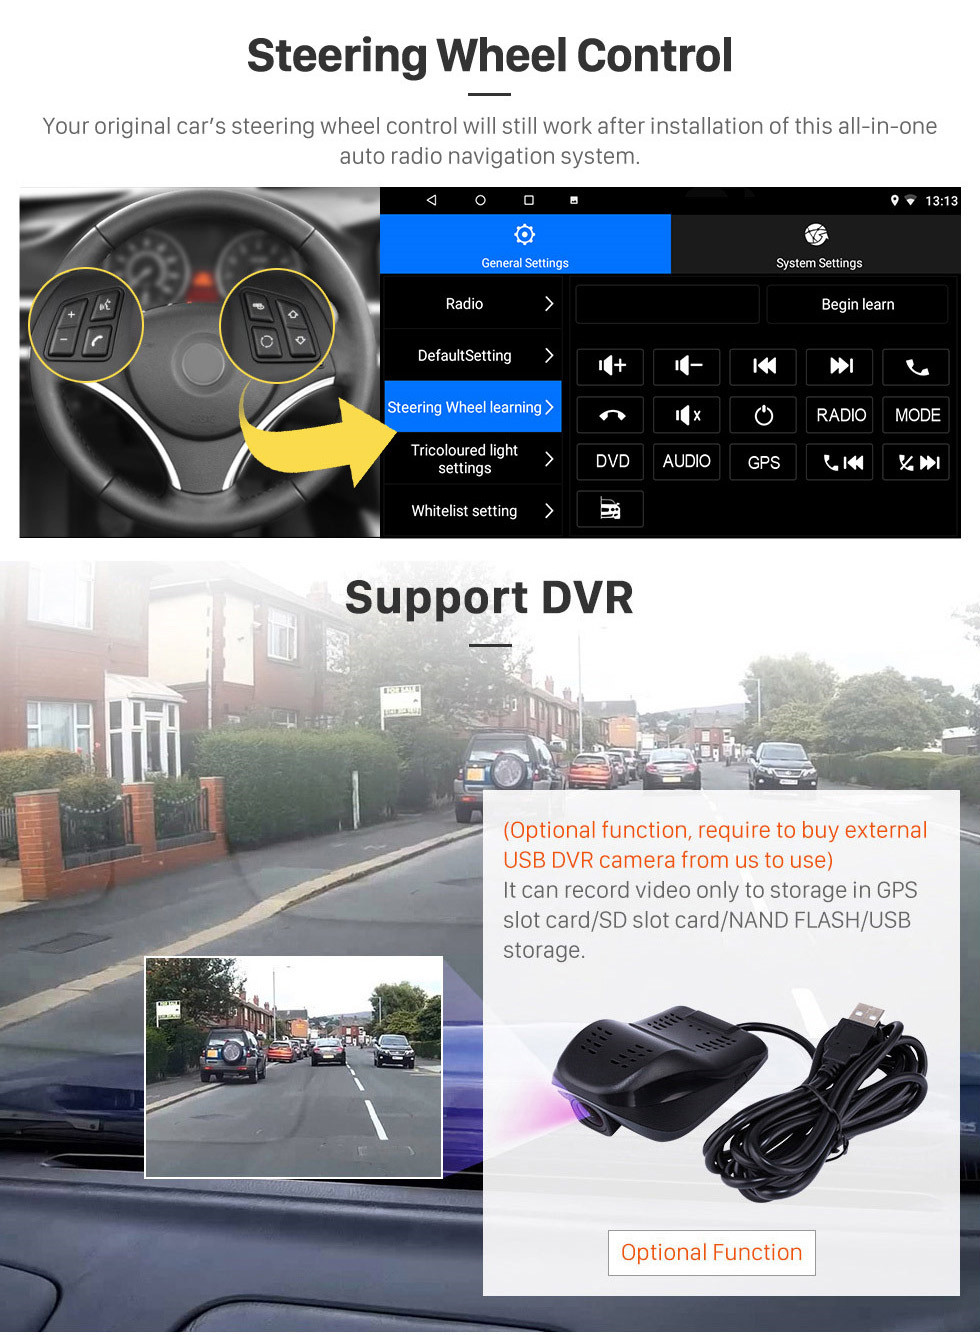 Seicane OEM 10.1 inch Android 10.0 Radio for 2012-2016 Citroen C4 C-QUATRE Bluetooth Wifi HD Touchscreen GPS Navigation AUX USB support OBD2 Carplay Mirror Link